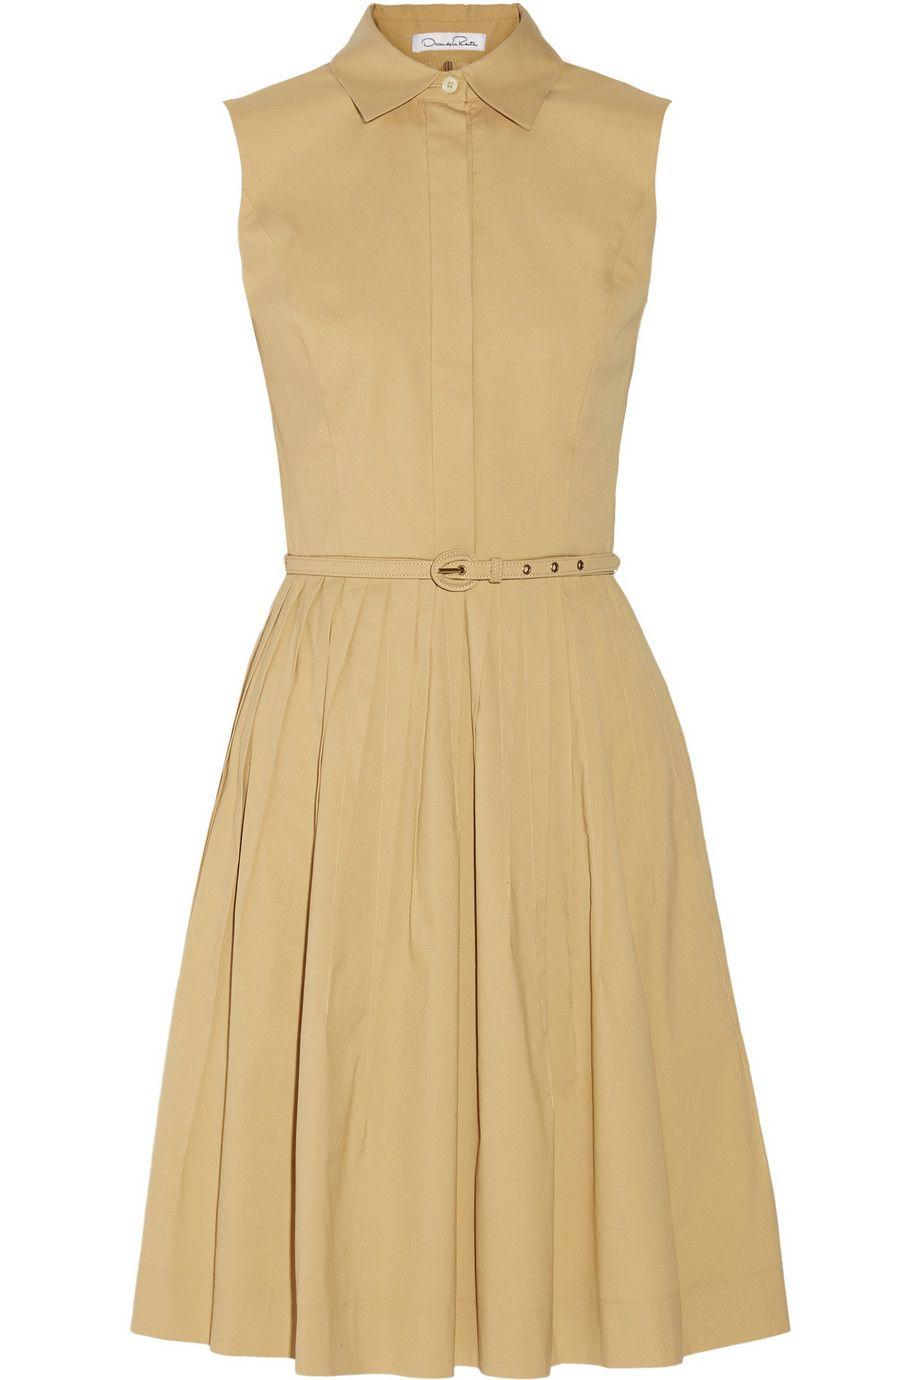 OSCAR DE LA RENTA Pleated cotton-blend dress